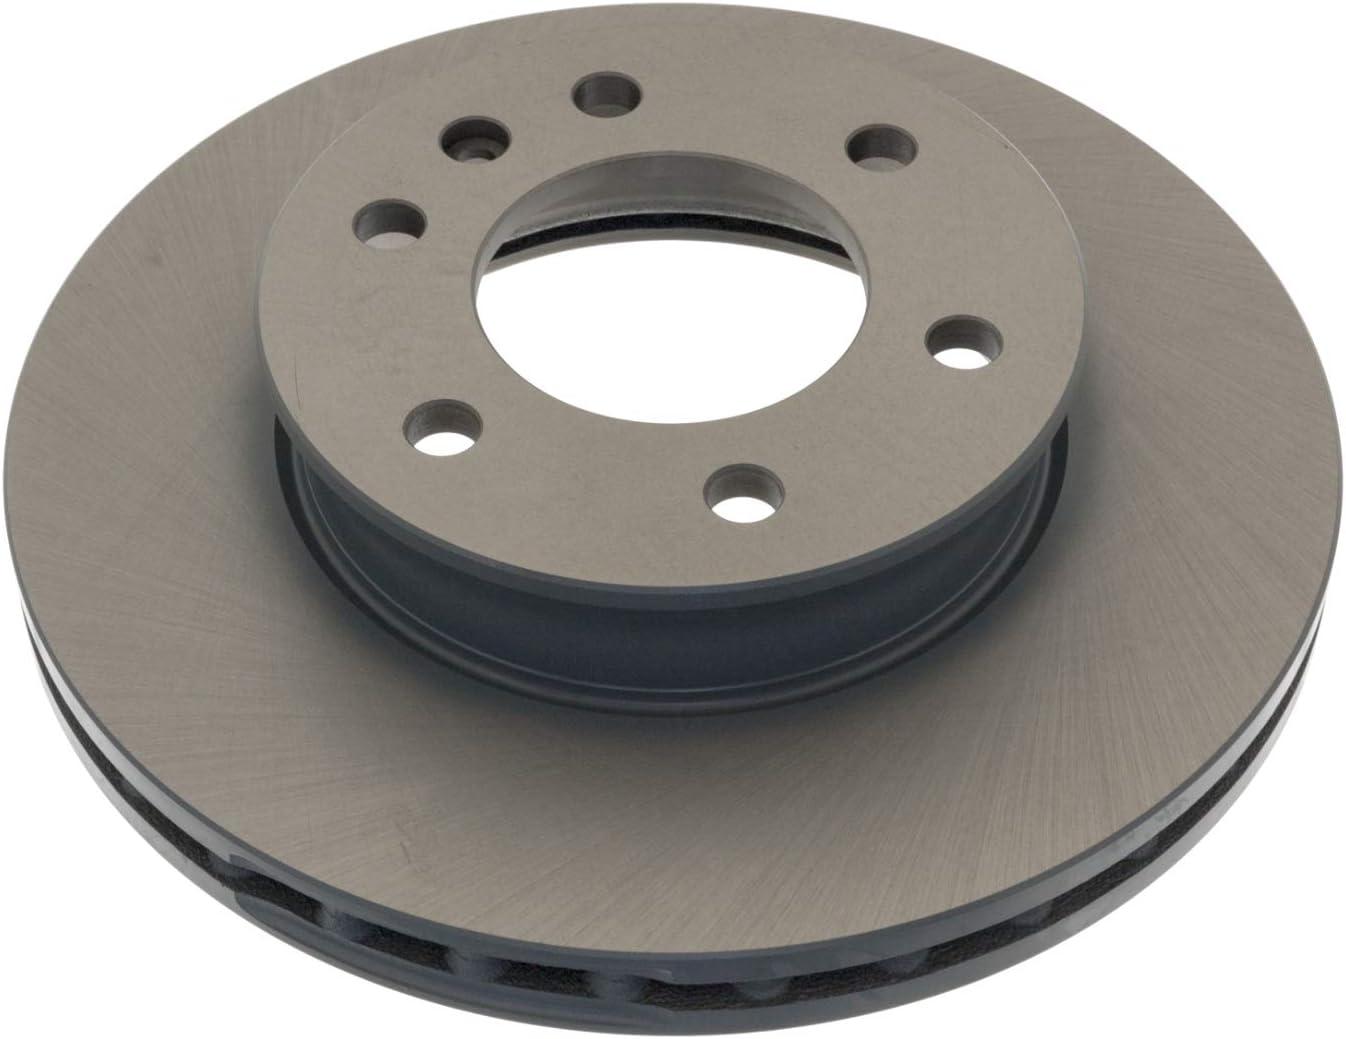 2 Brake Disc of Holes 6 front febi bilstein 27698 Brake Disc Set internally ventilated No